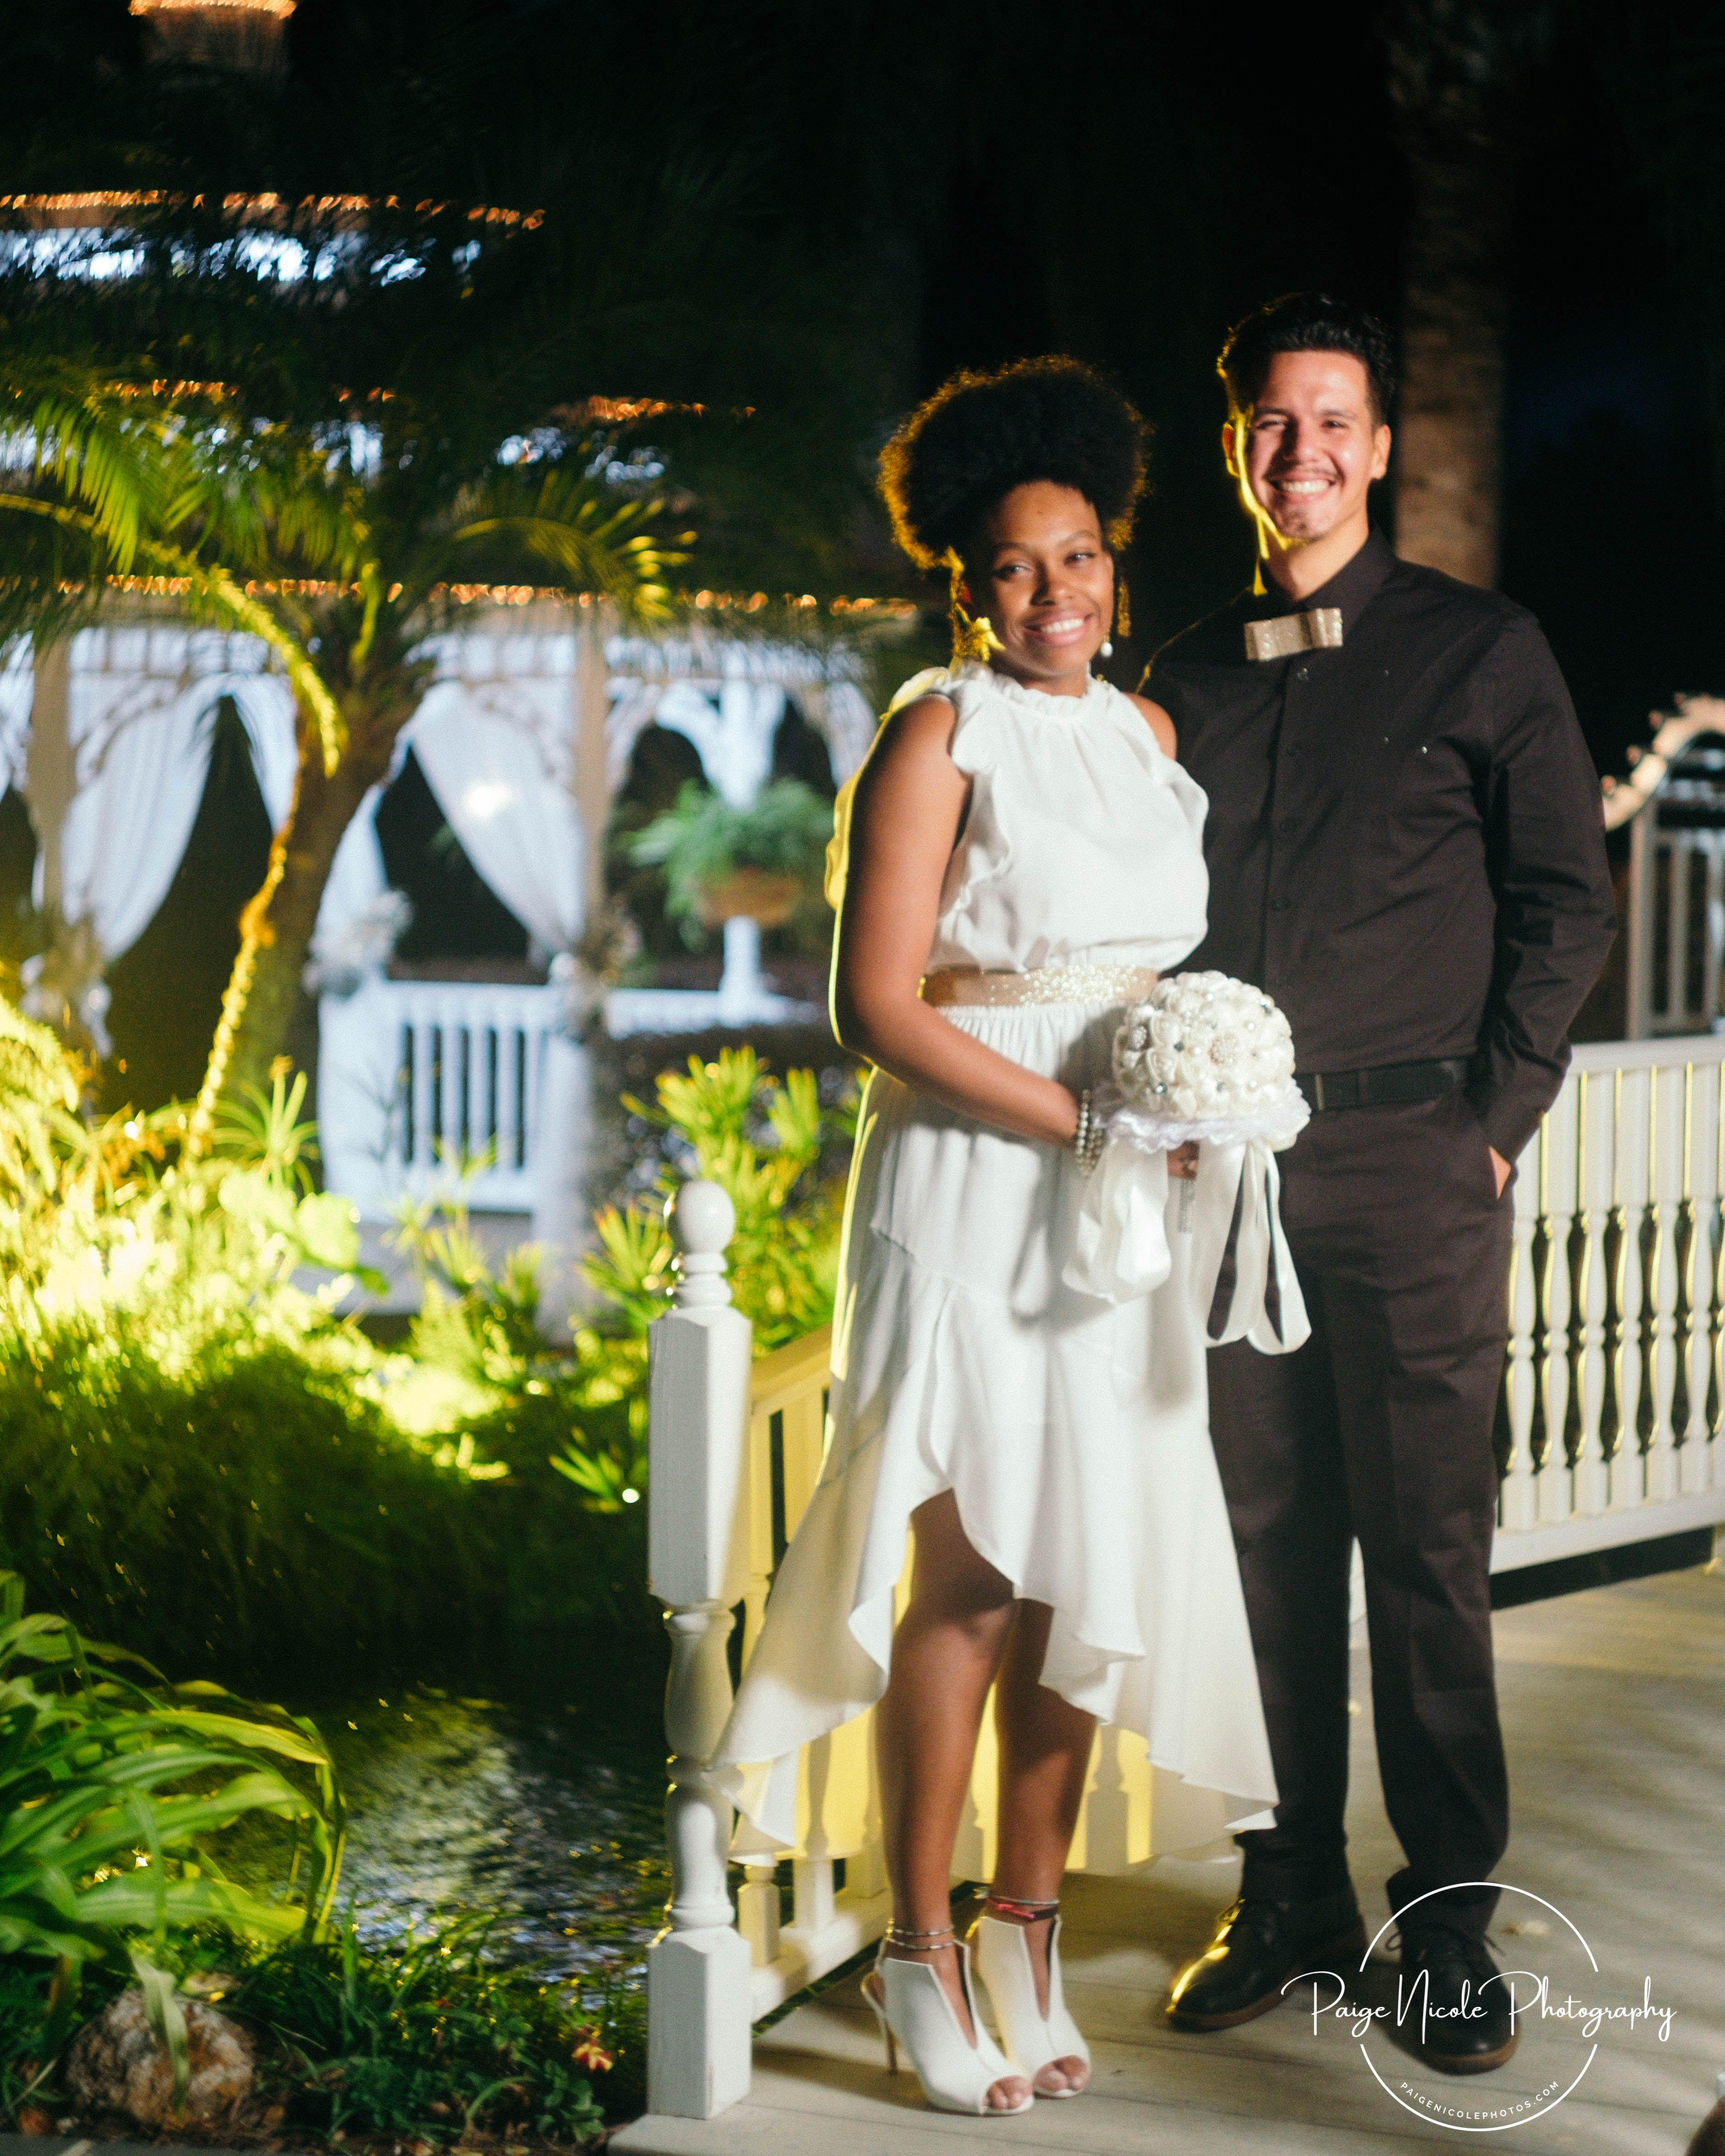 Eustis Wedding Orlando Wedding Photographer Orlando Wedding Photographer Orlando Photographers Orlando Wedding